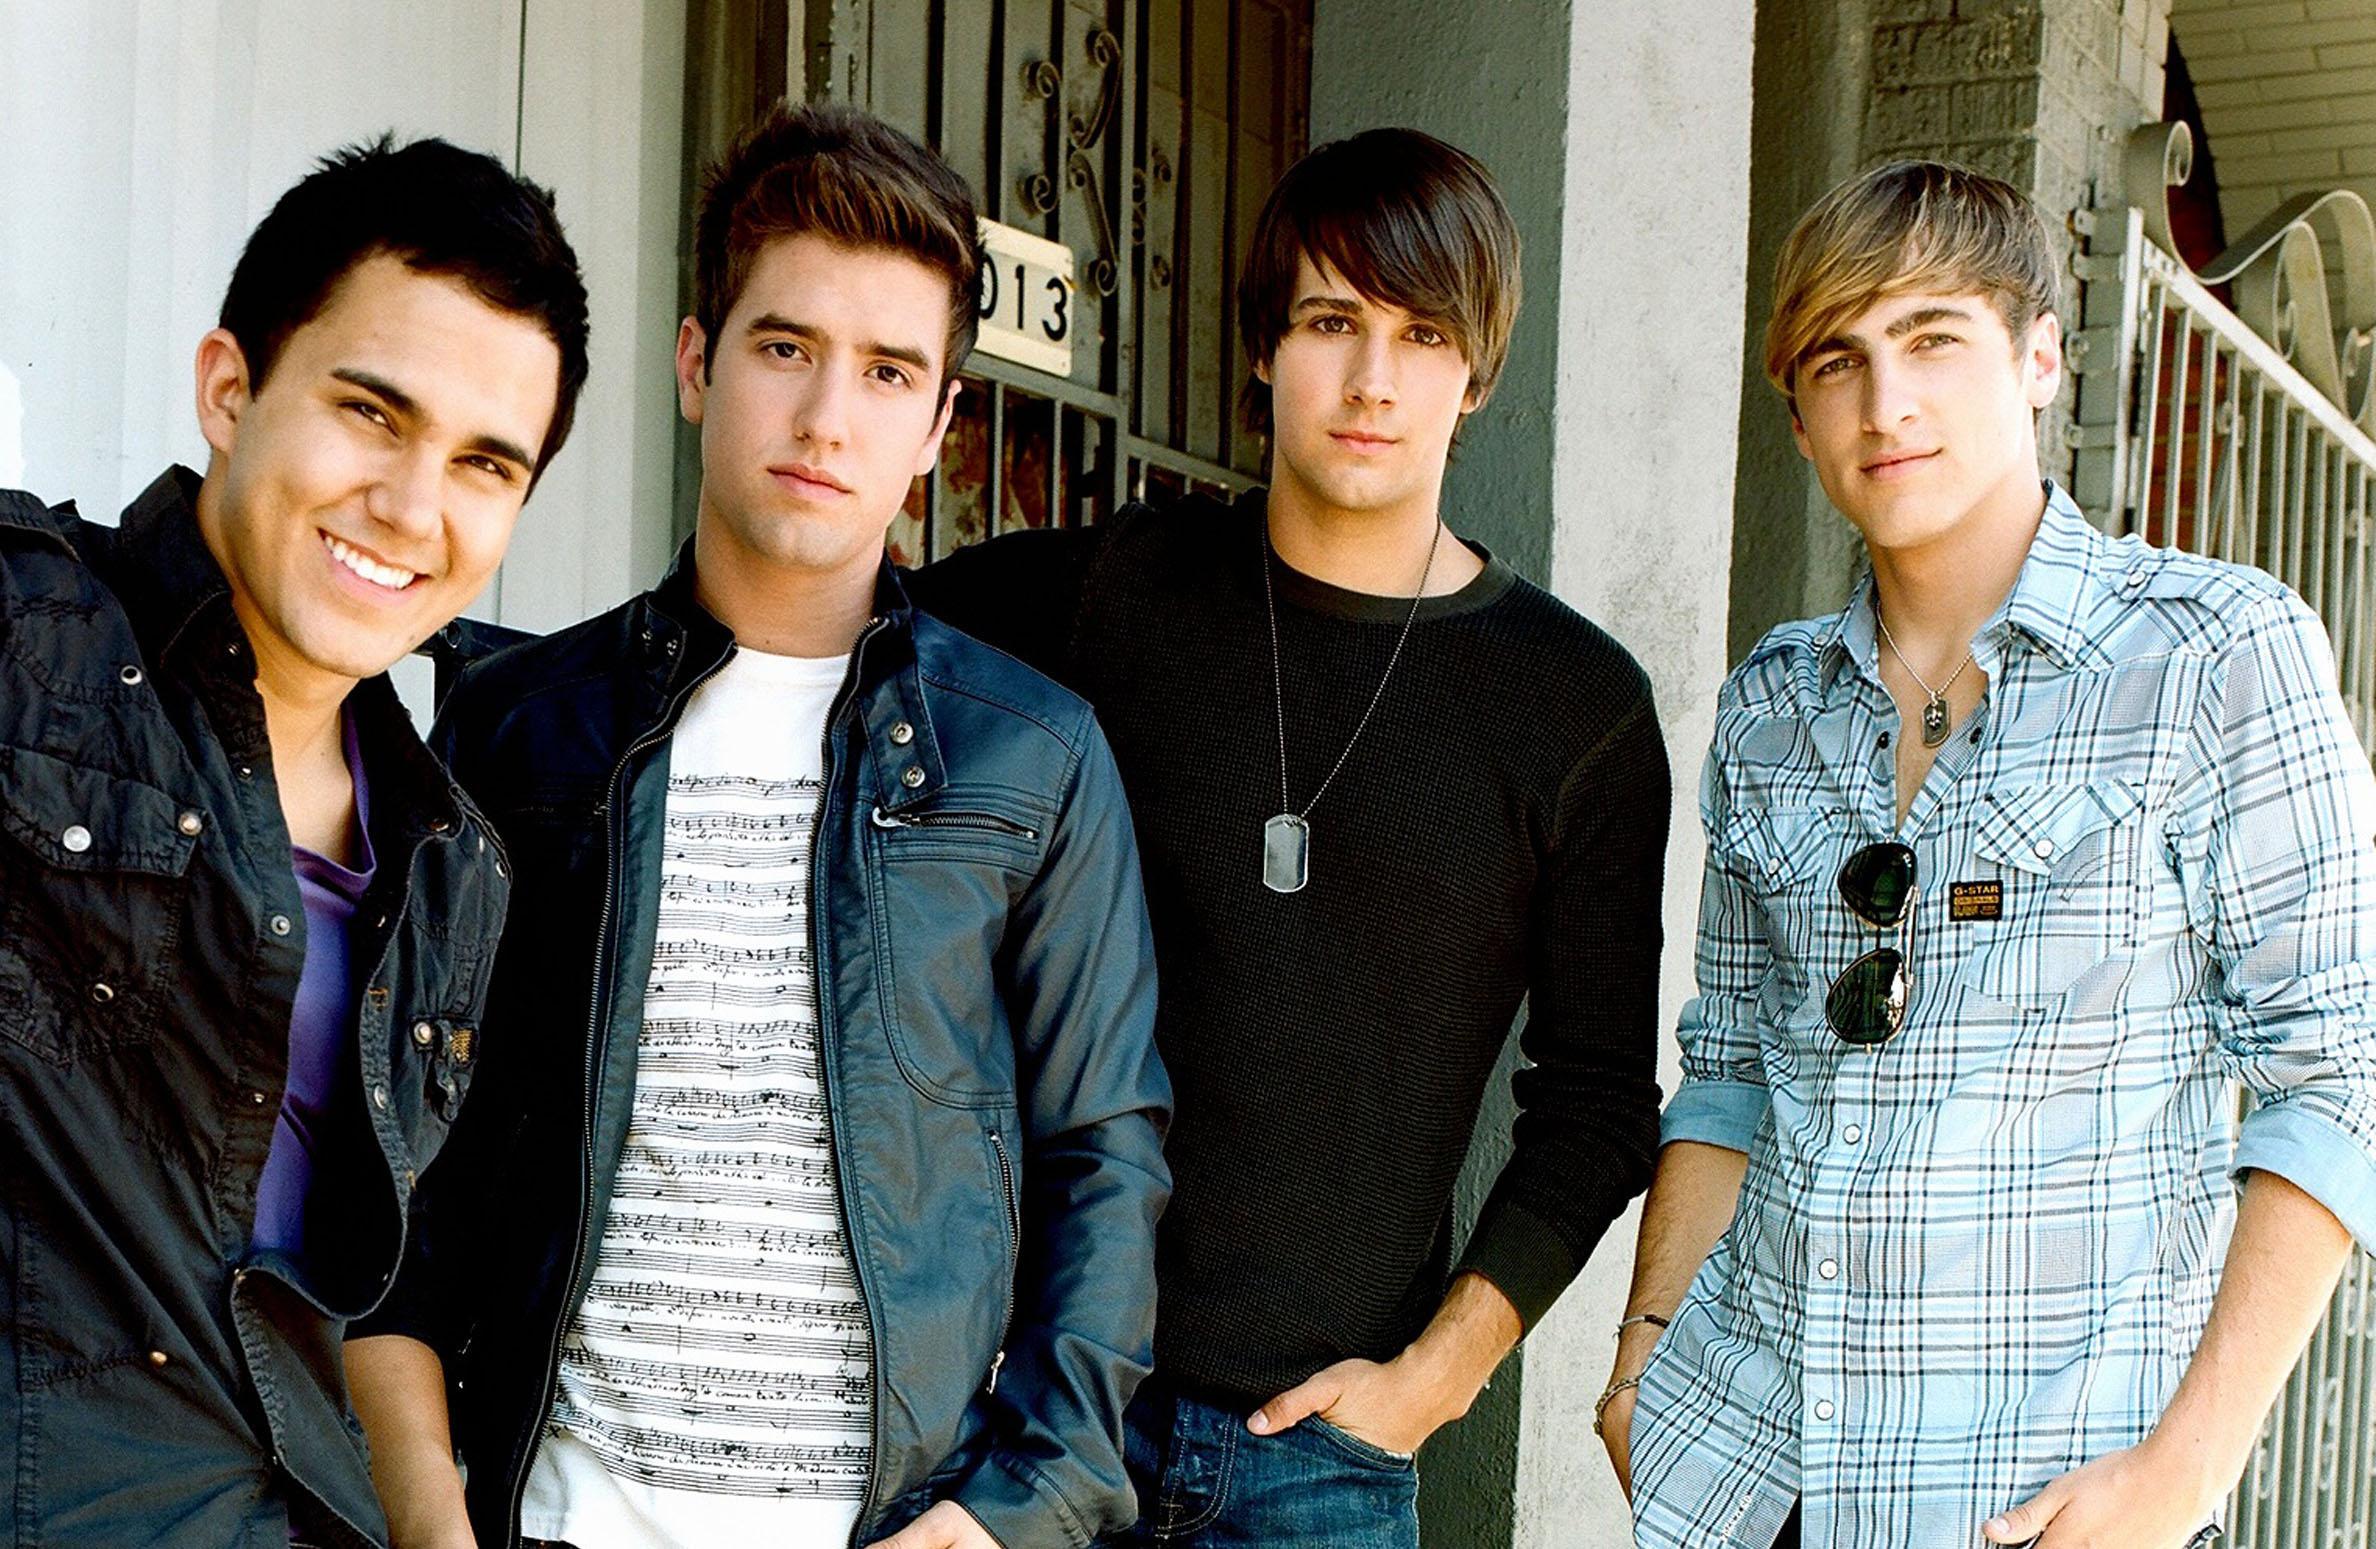 L-R Carlos Pena, Logan Henderson, James Maslow, Kendall Schmidt of Nickelodeon's Big Time Rush. credit : Sony